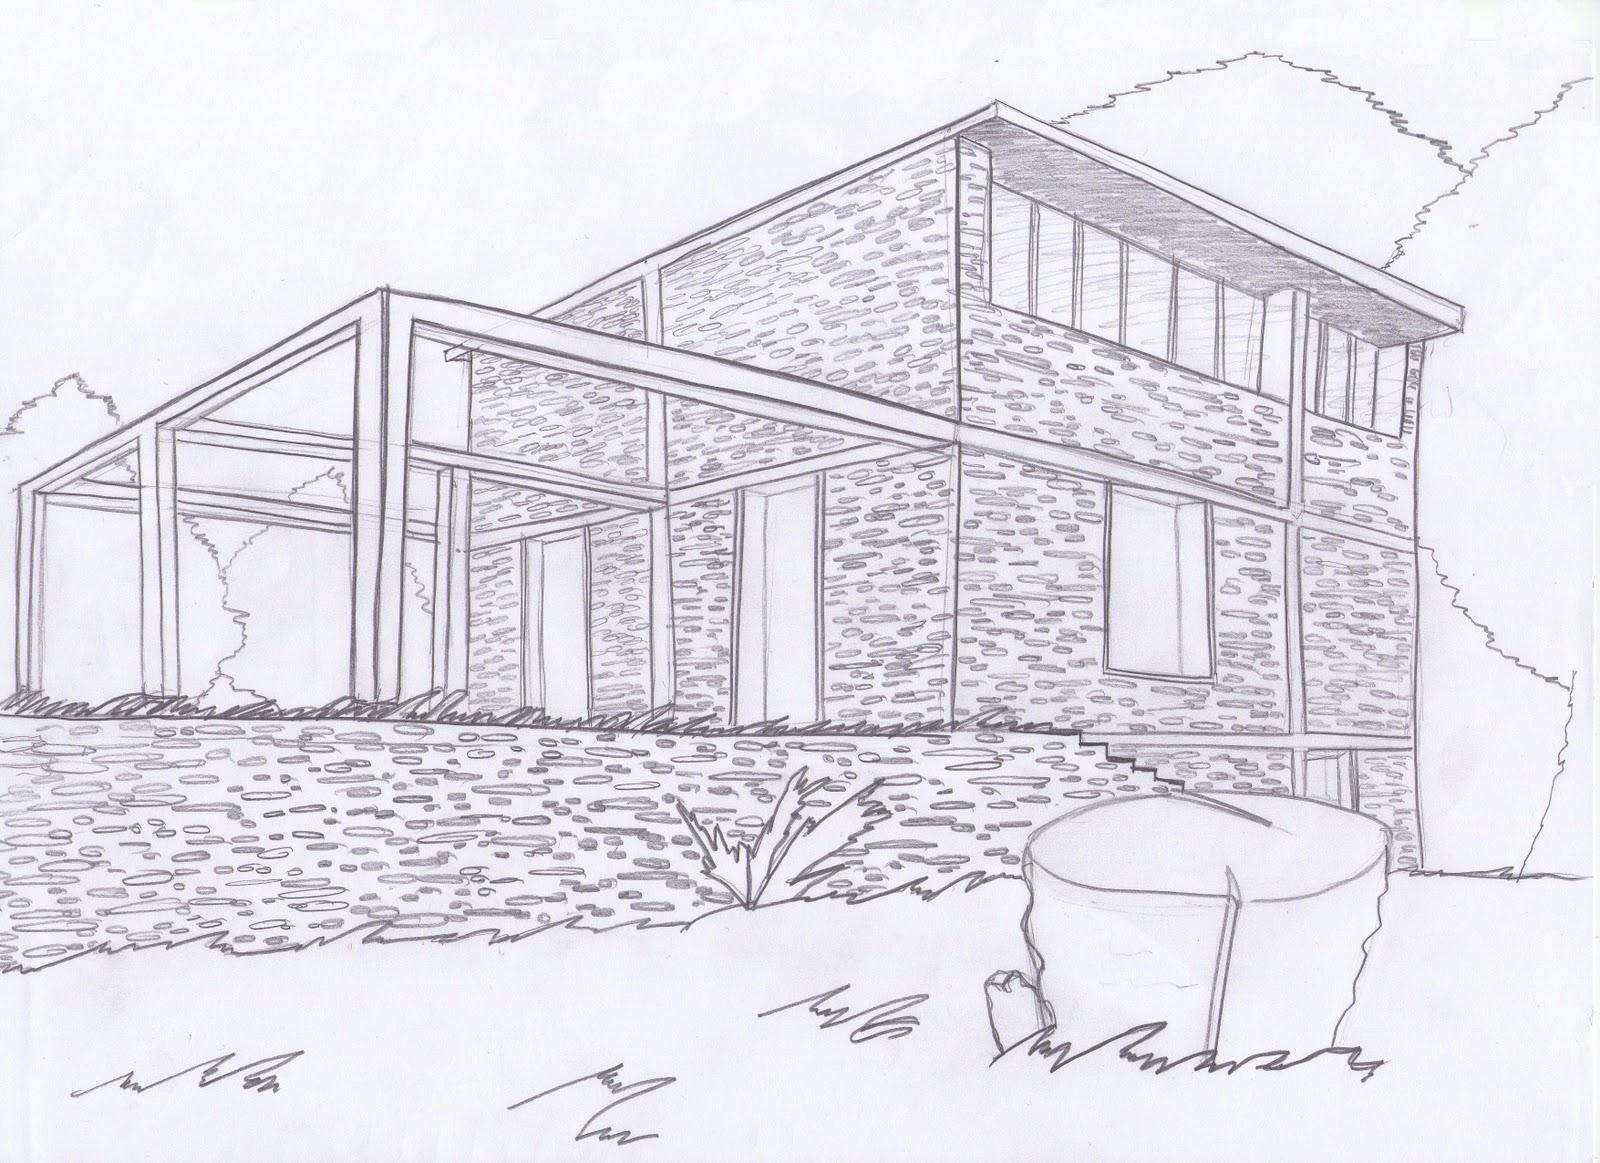 Casa de piedra dibujo - Dibujos de piedras ...